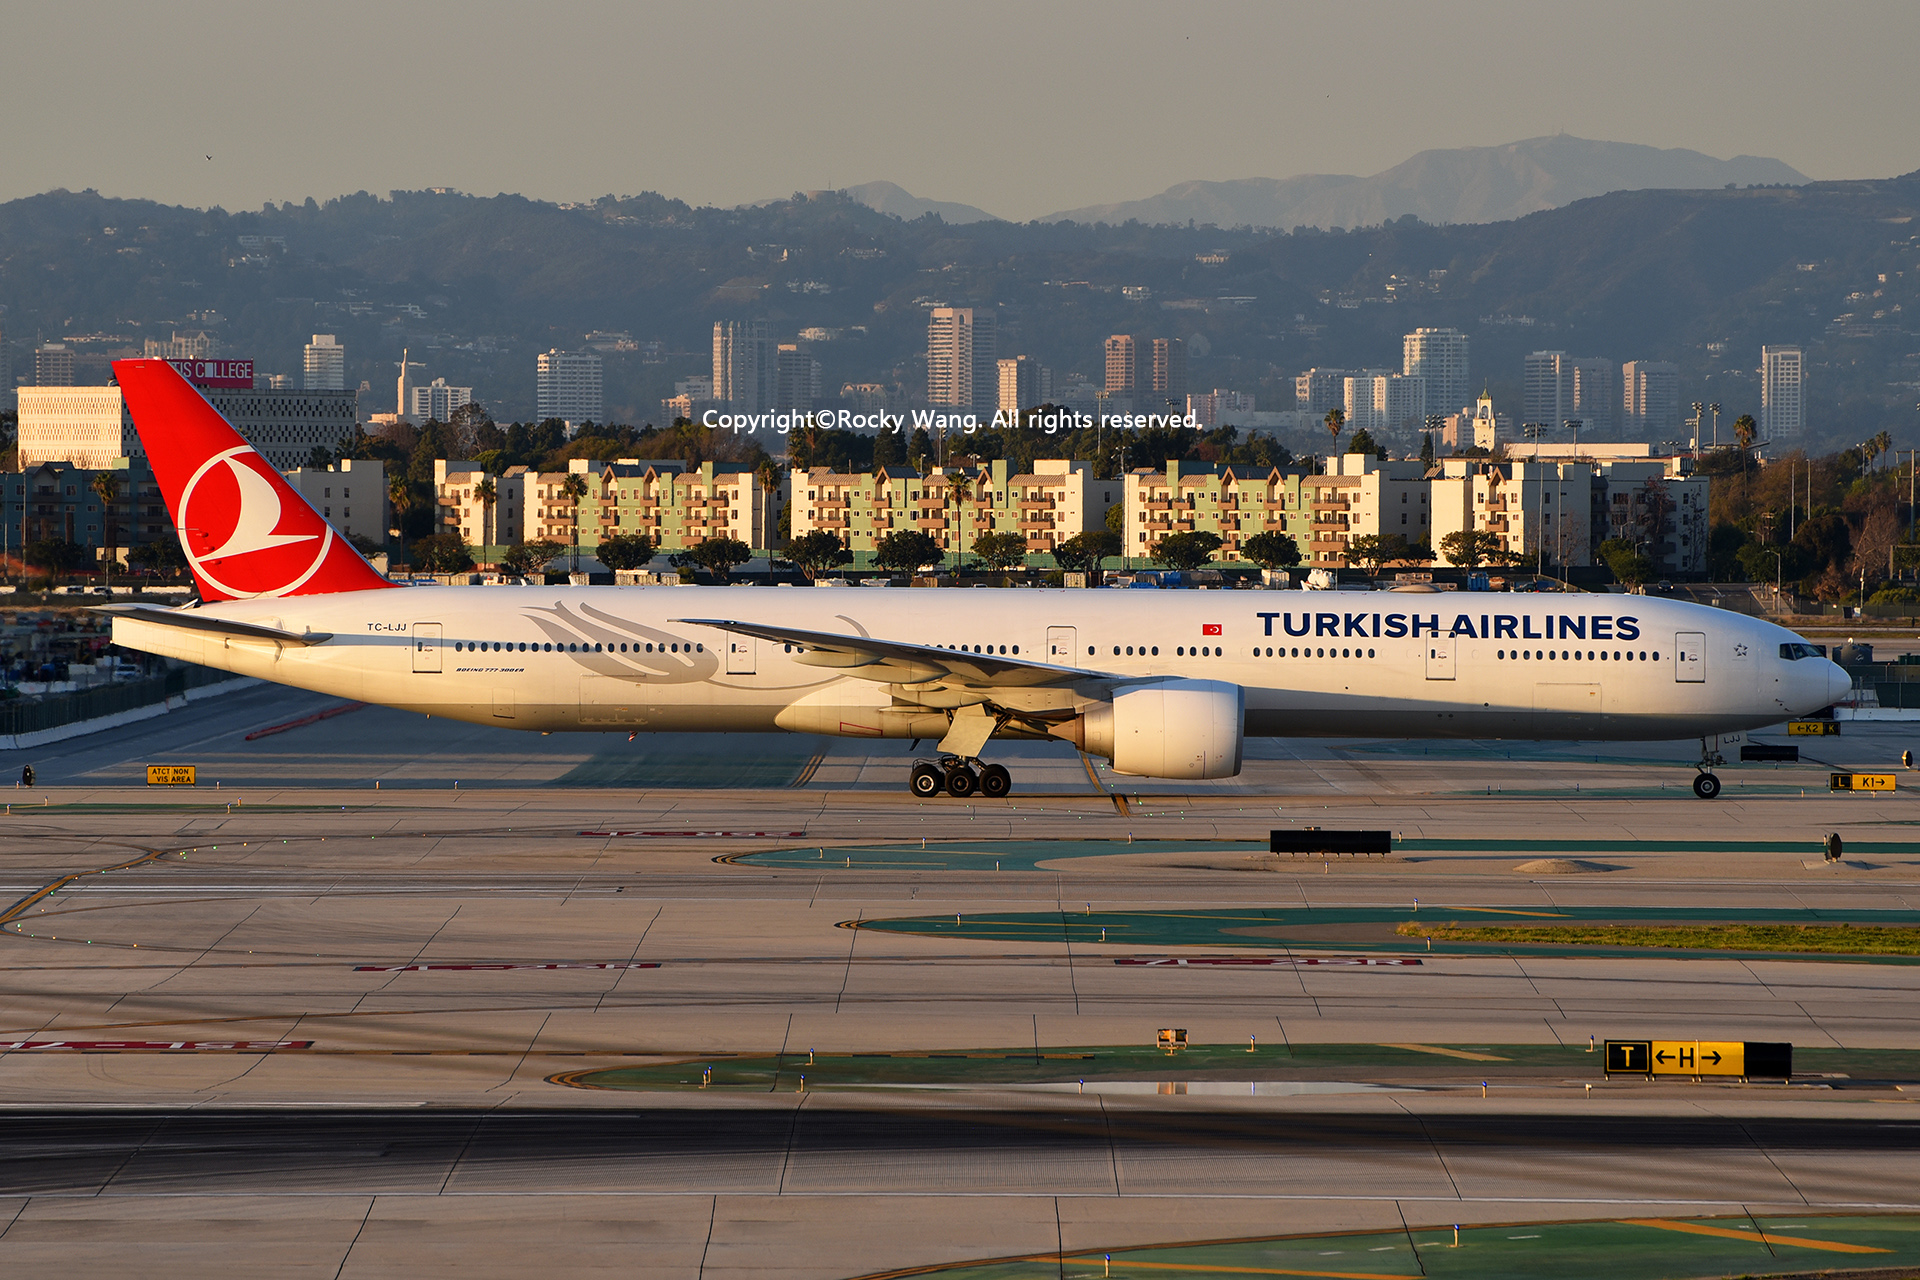 Re:[原创]居家了 批量处理老图 倾情奉献52家777 BOEING 777-3F2ER TC-LJJ Los Angeles Int'l Airport